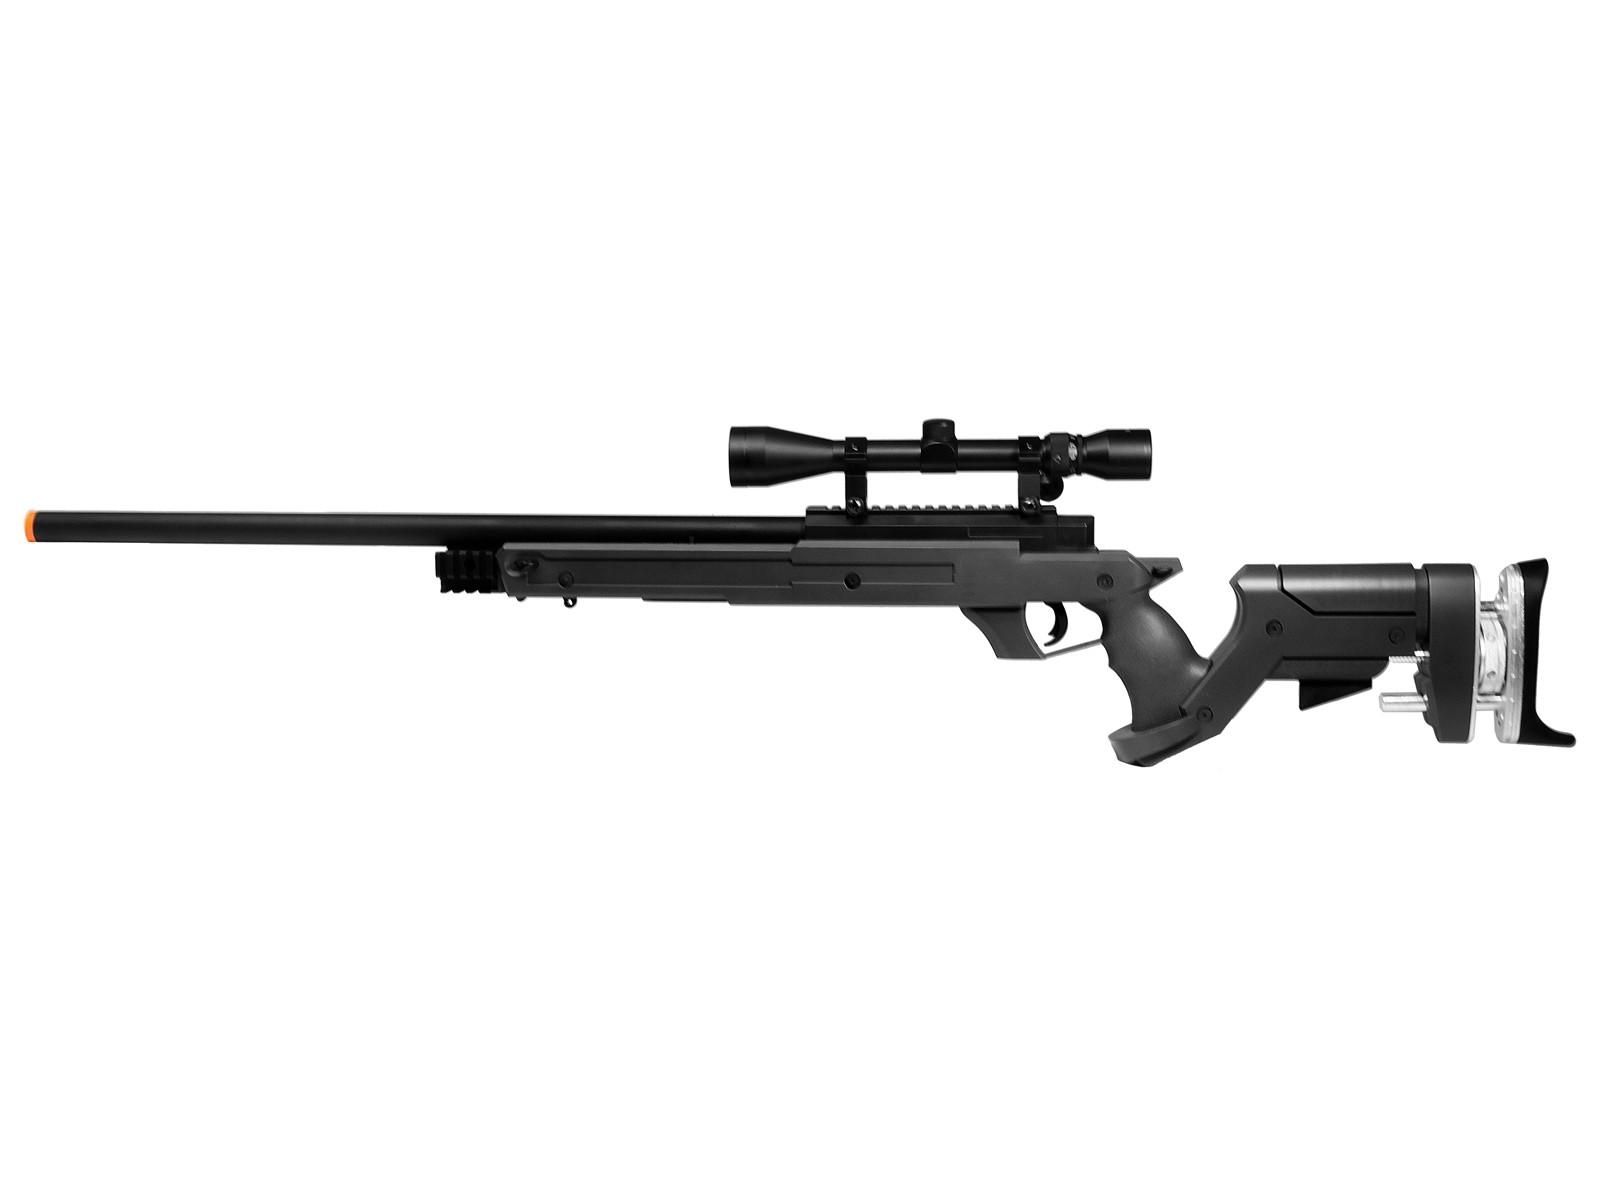 TSD_Tactical_SD97_Airsoft_Sniper_Rifle_Black_6mm